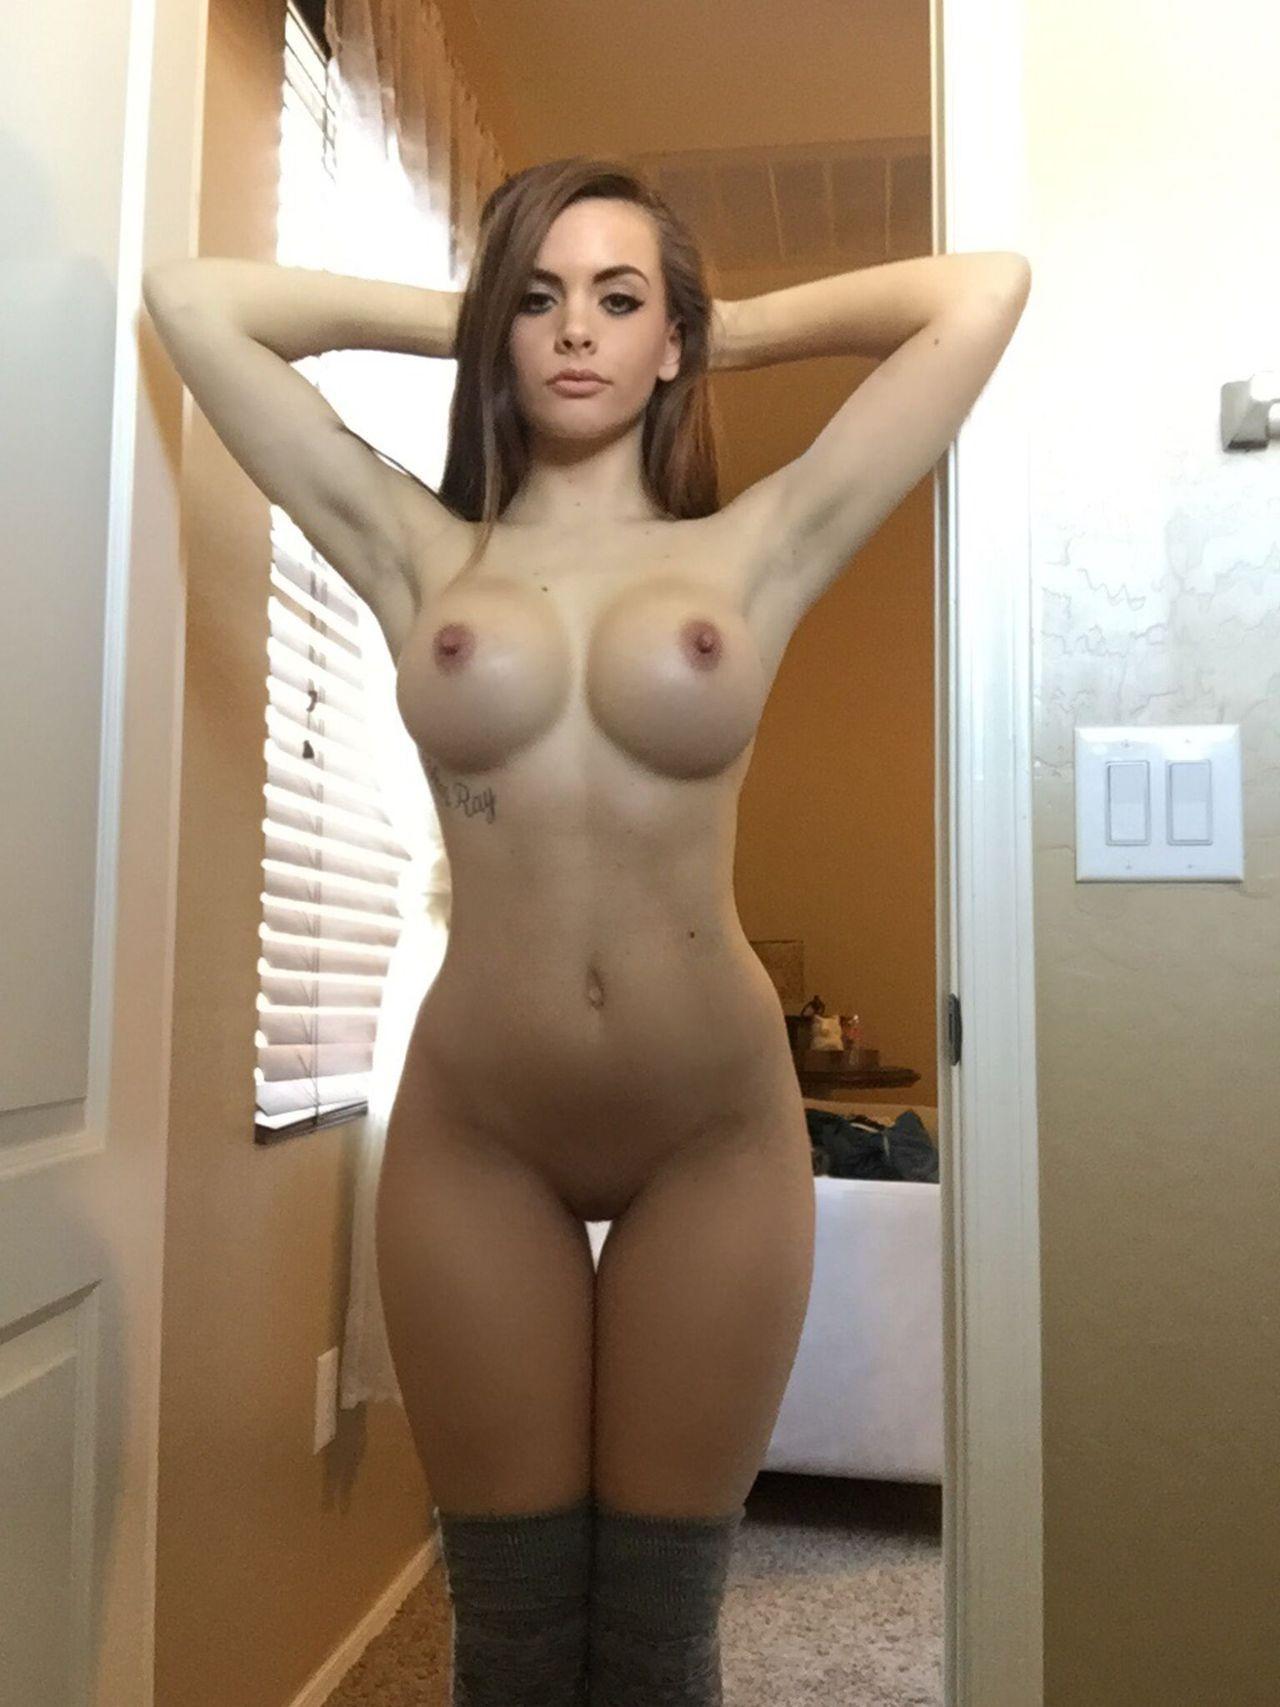 small chick big tits